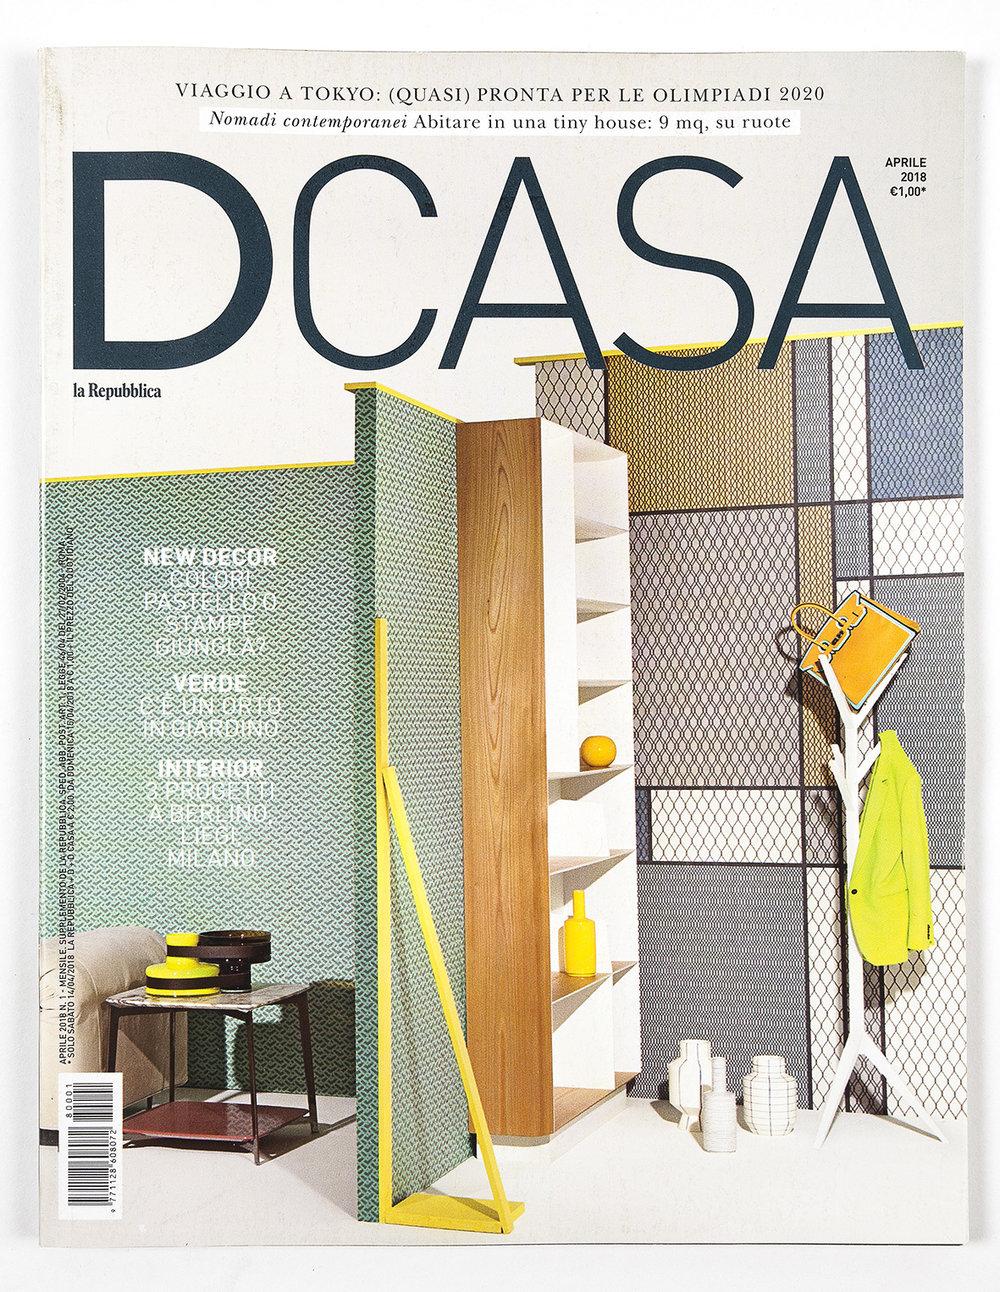 DCASA_CAROLINE_DETHIER_COVER_MAIL.jpg